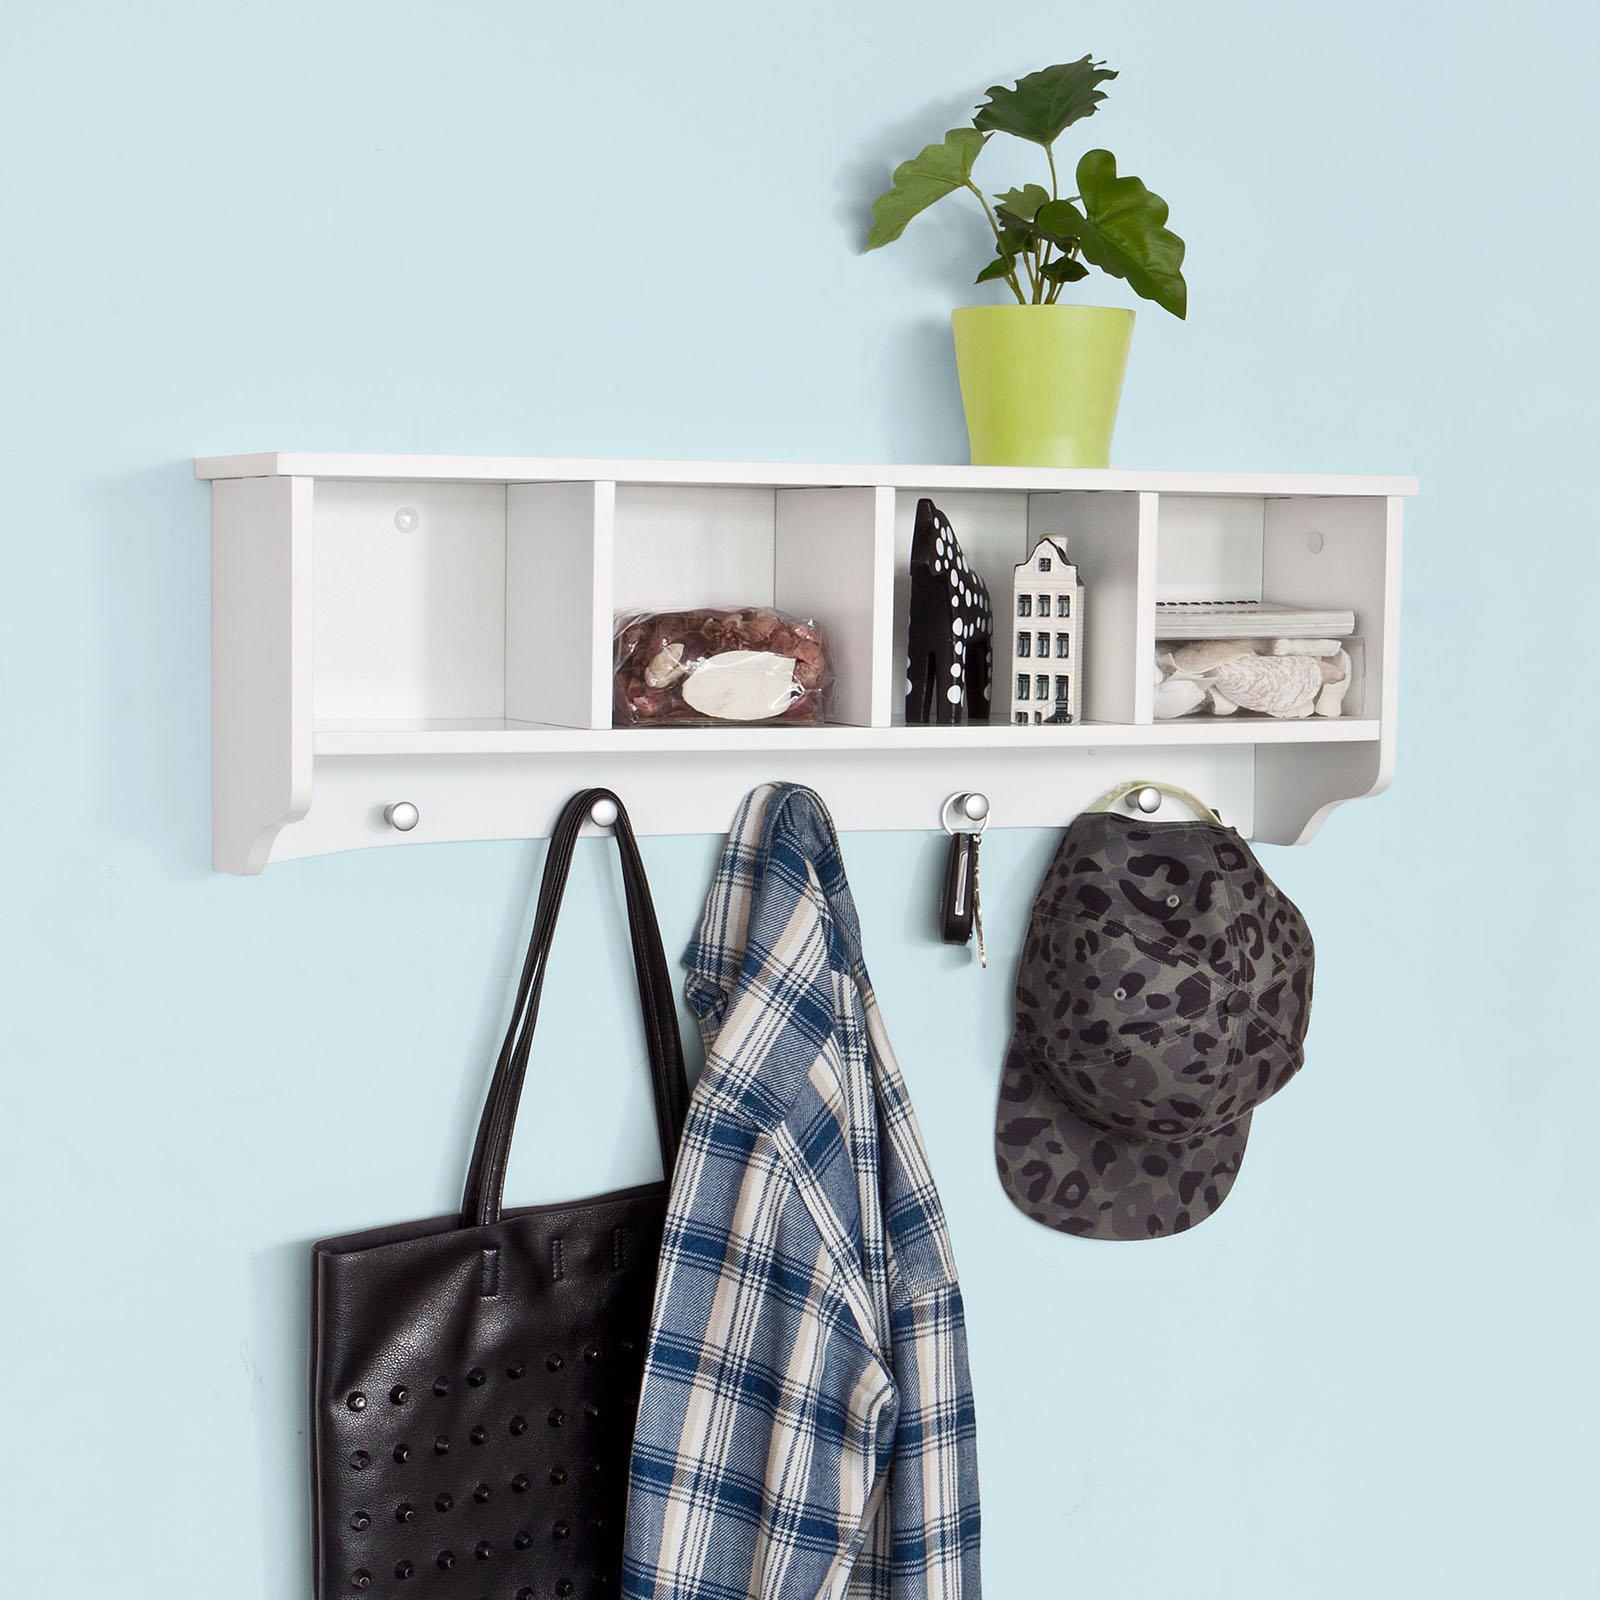 SoBuy Wall Shelves,Wall rack,Wall Cabinets ,Wall-Mounted Cabinets ,Storage Racks, Hanging Entryway Shelf,Storage Shelf ,and Coat Rack Wall Shelf with Hooks (FRG48-L-W)